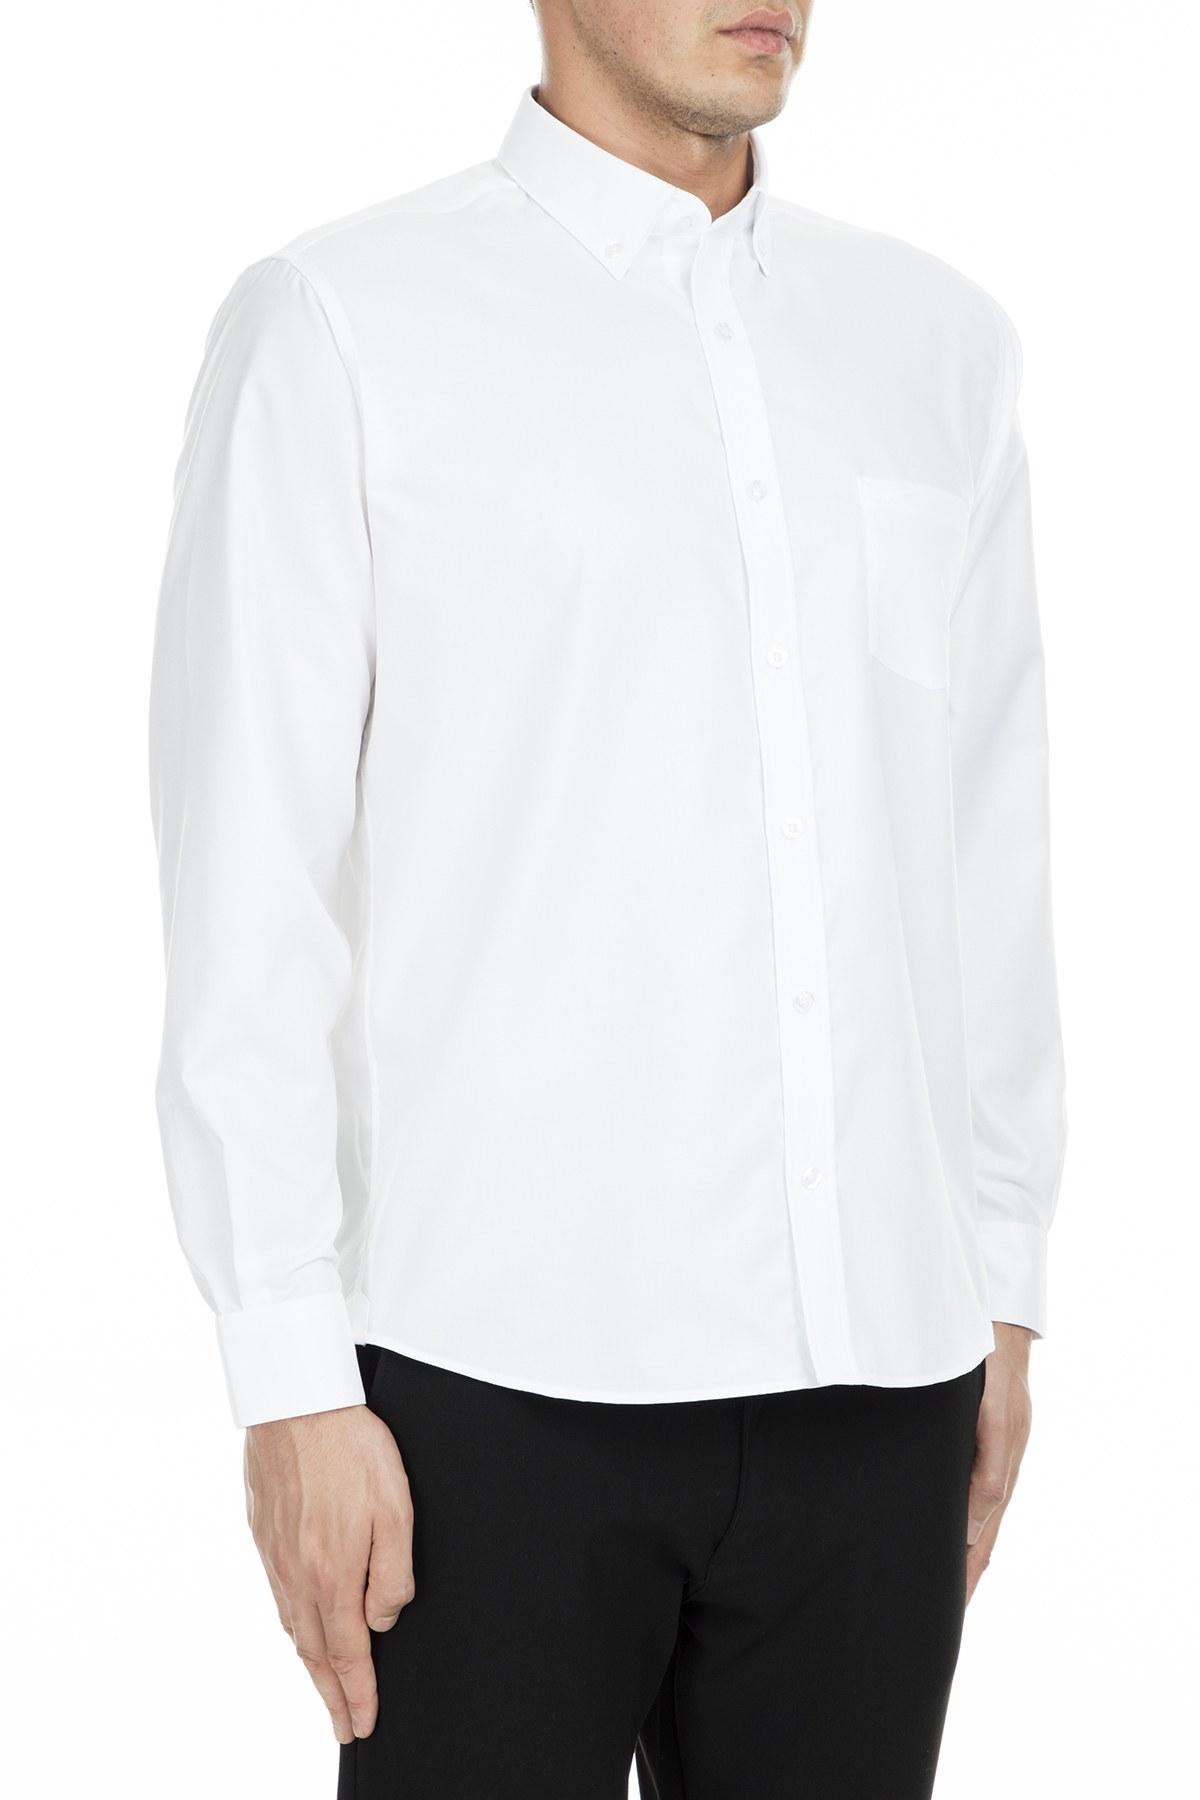 Lacoste Regular Fit Erkek Gömlek CH9623 800 BEYAZ